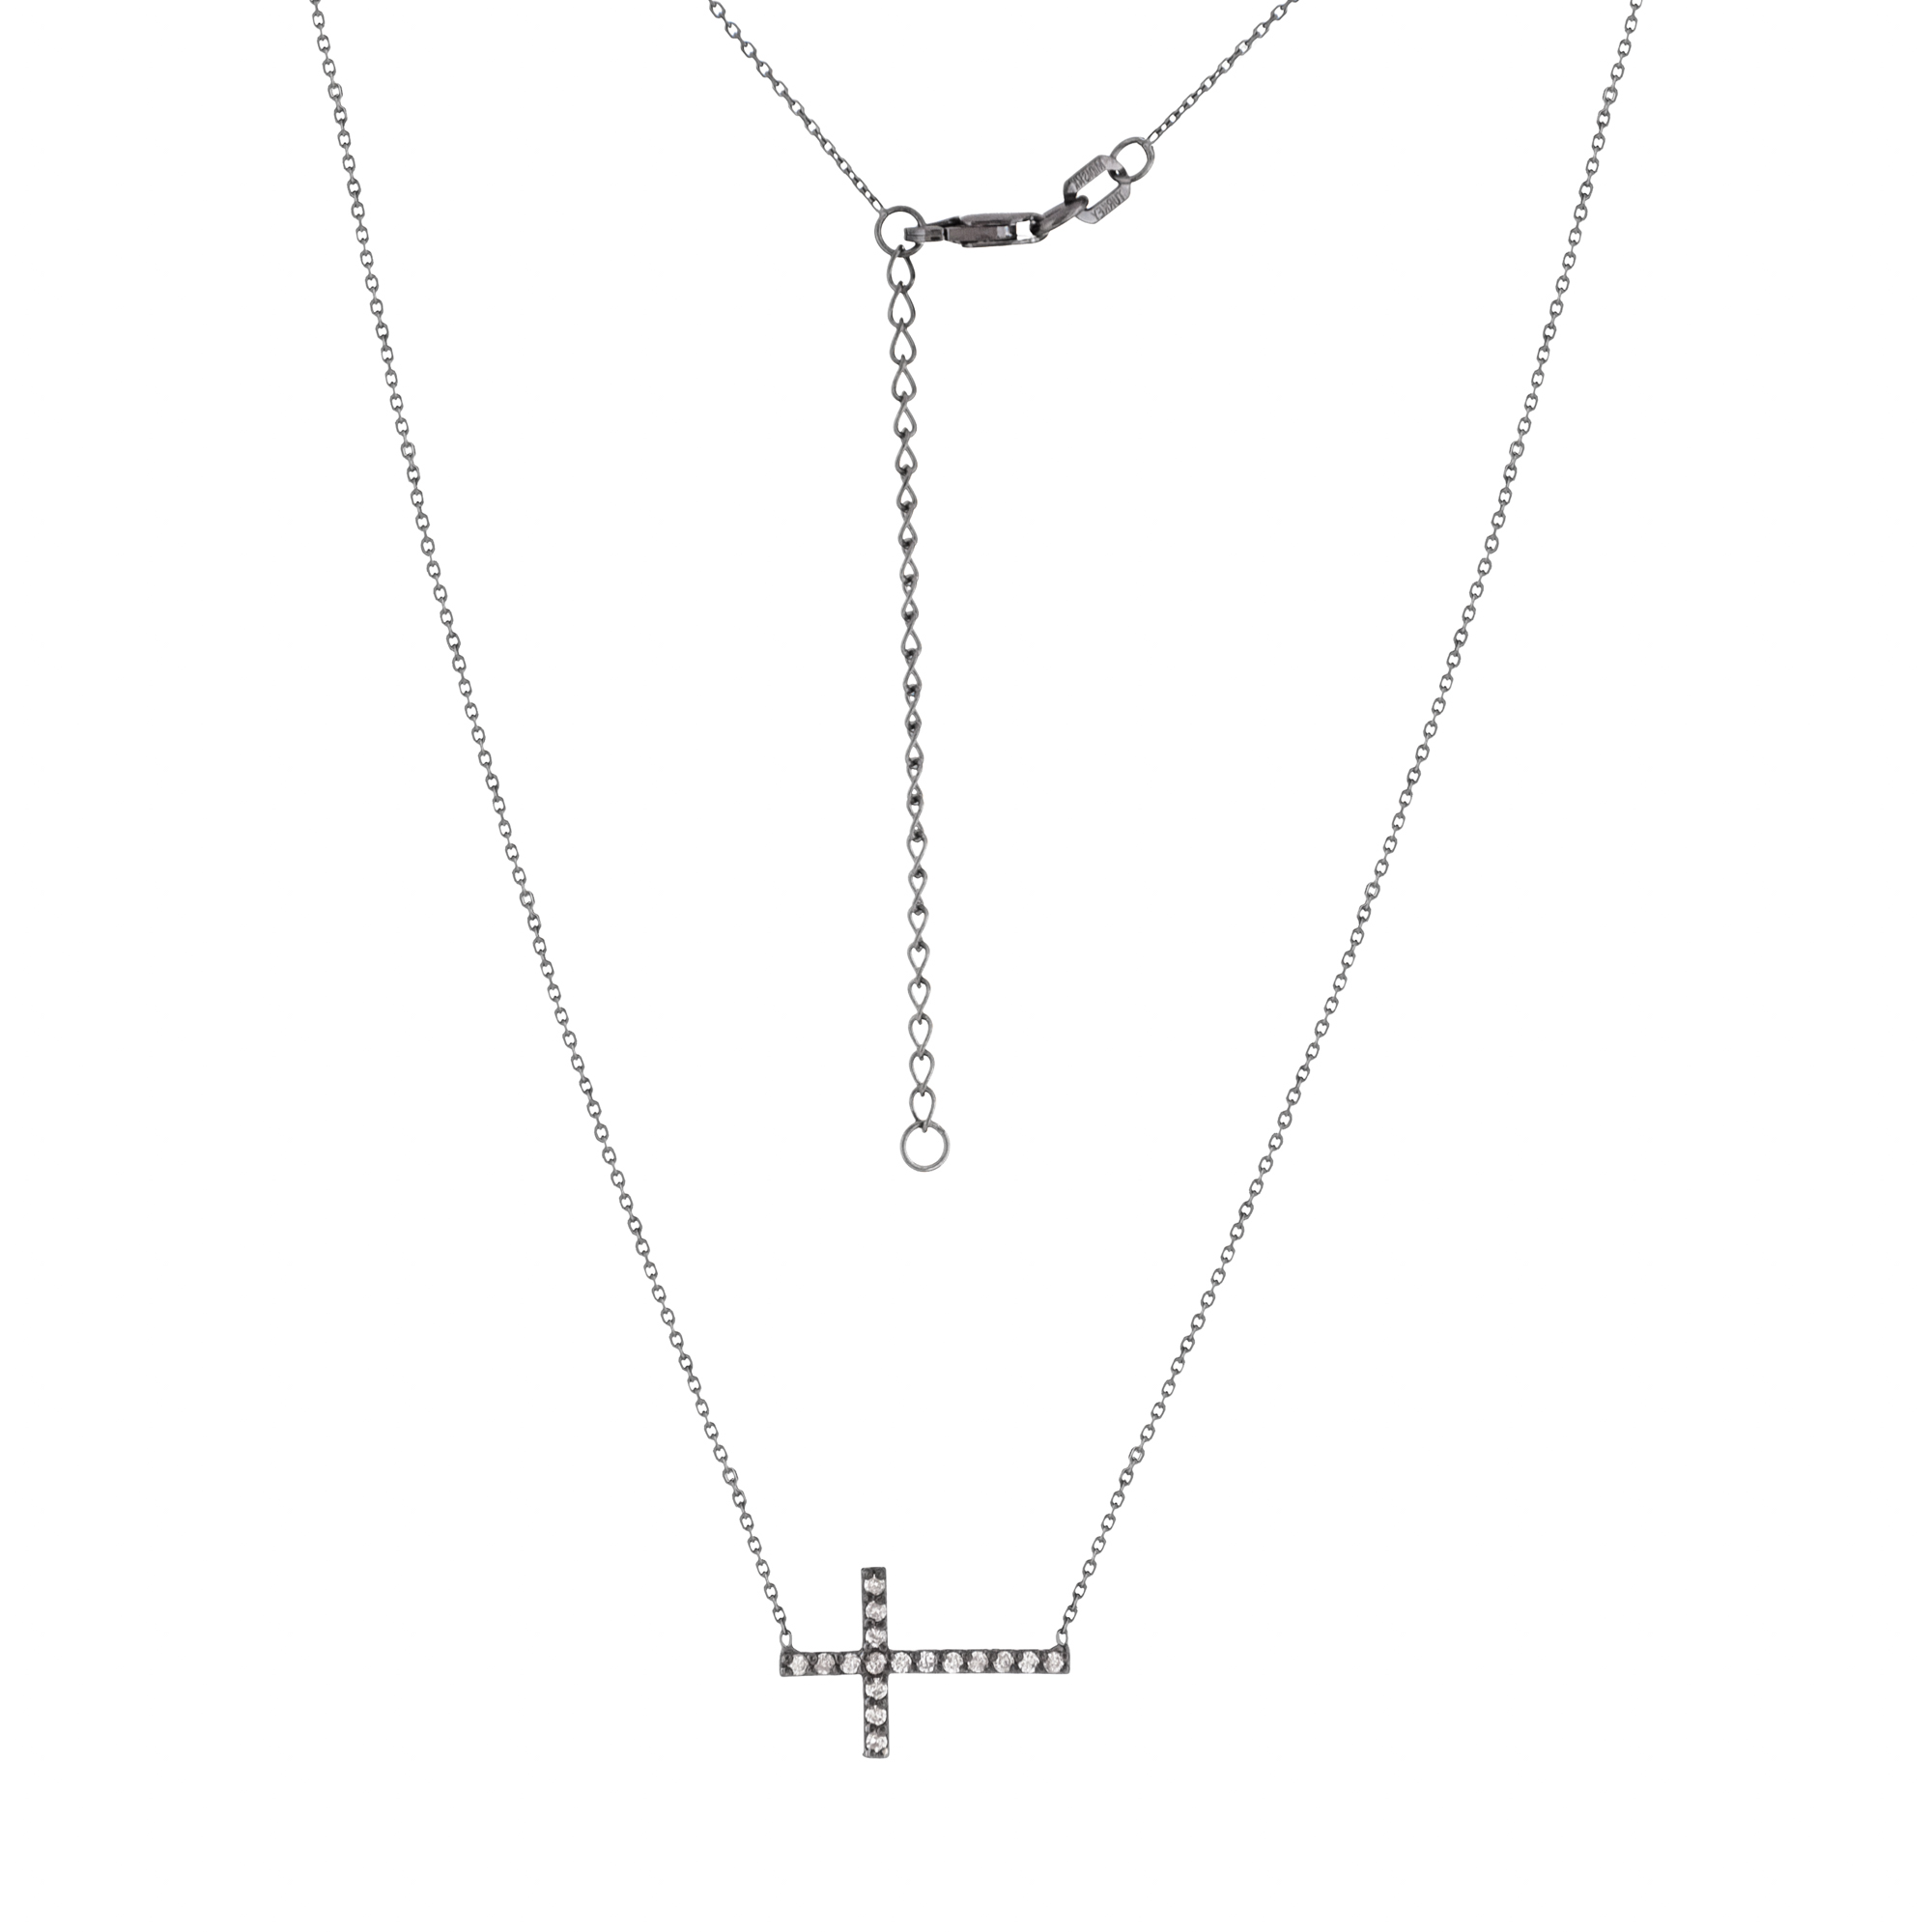 Cross Necklace, 14Kt Gold& Diamond Cross Necklace 18